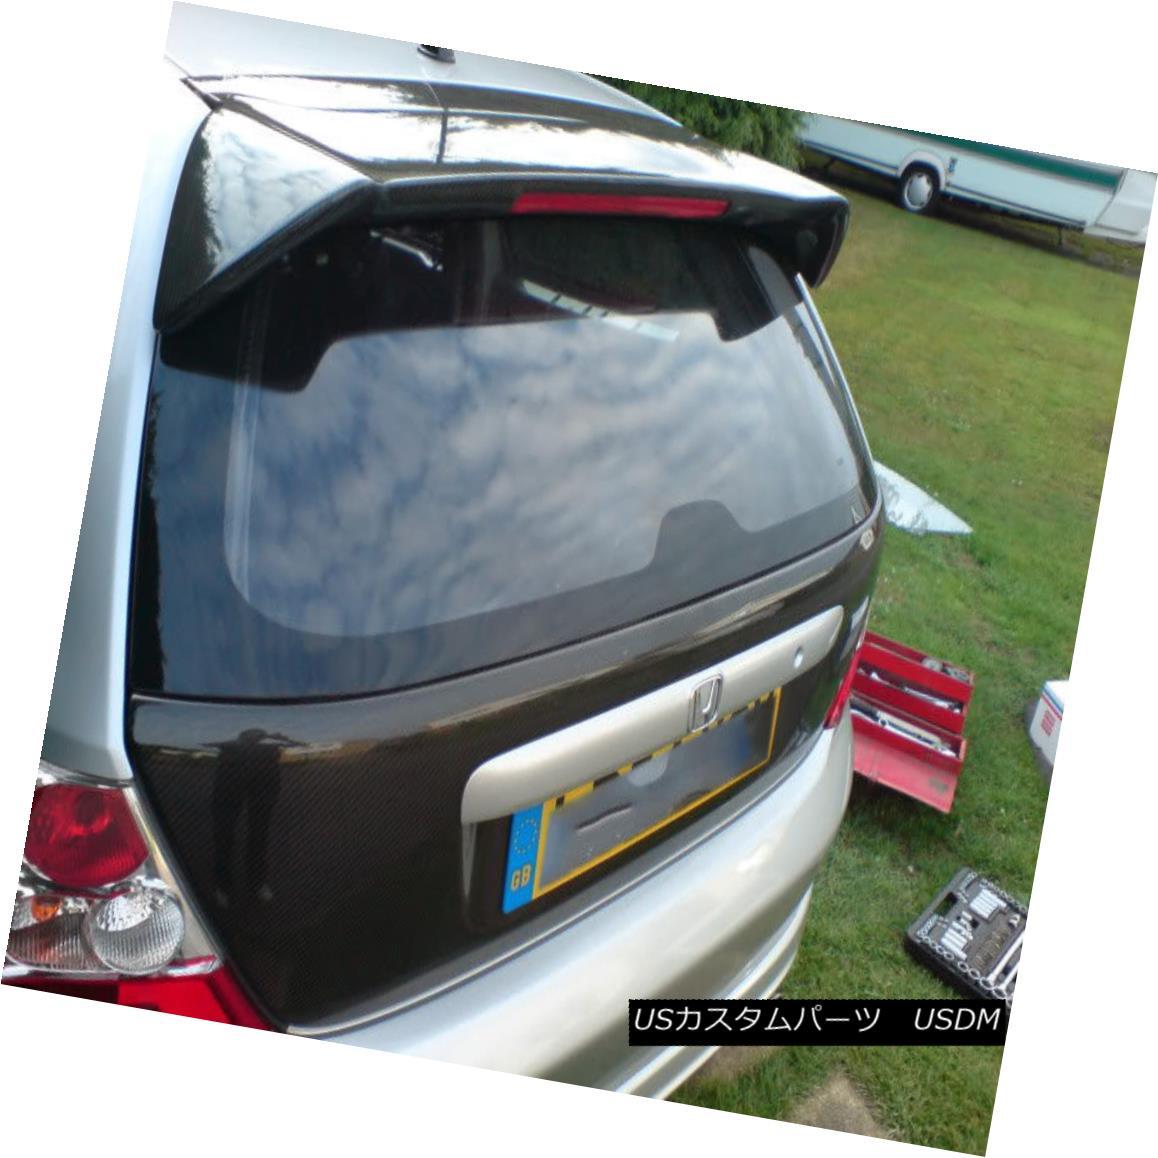 Hatch Honda Rear lights ABC Hatch 01-05 For Civic EP エアロパーツ Carbon Civic OEMカーボン・リア・スポイラー(ブレーキライト付き) OEM EP ホンダ用ABC wbrake With Spoiler 01-05